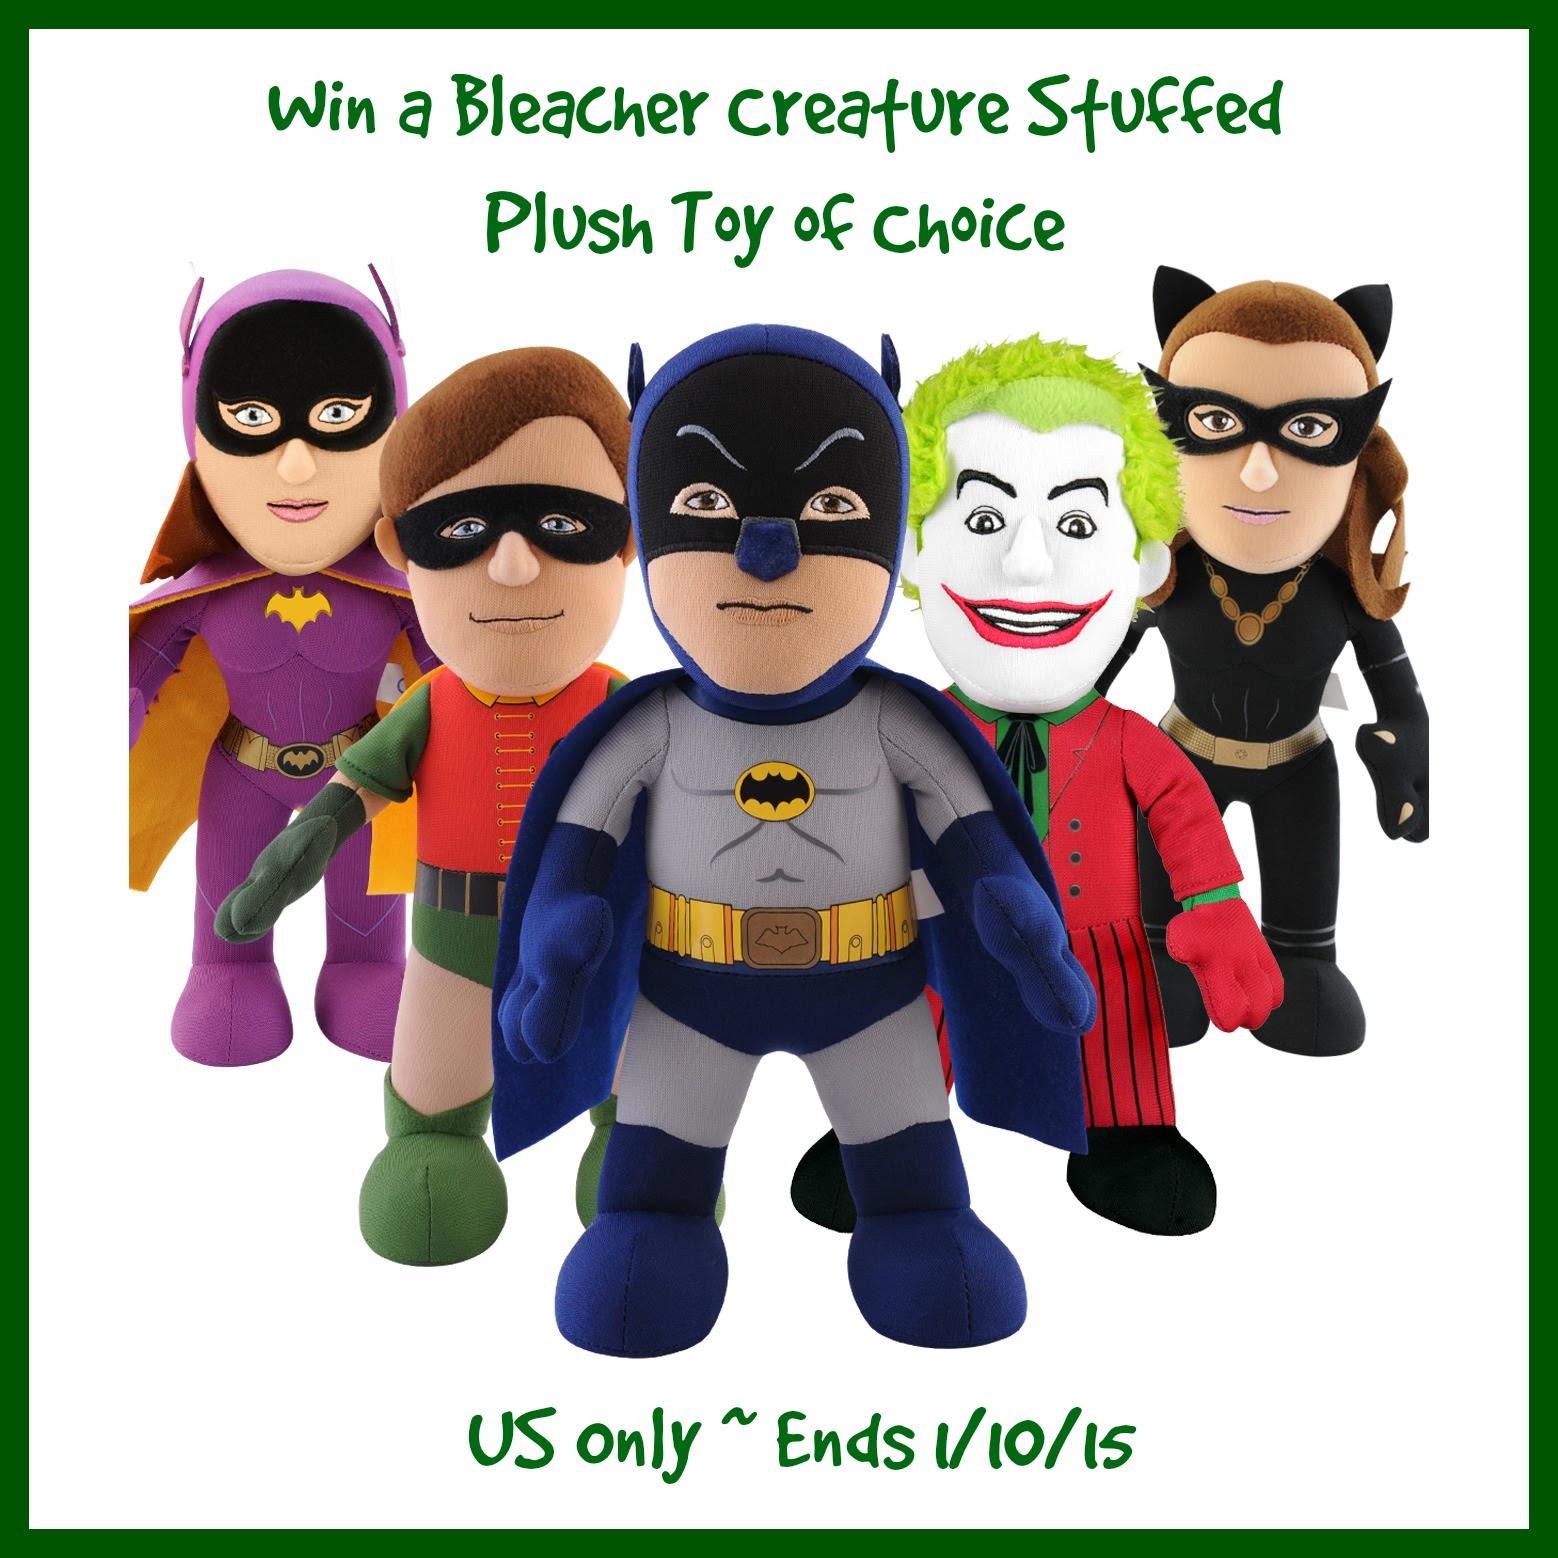 Enter the Bleacher Creature Giveaway. Ends 1/10.